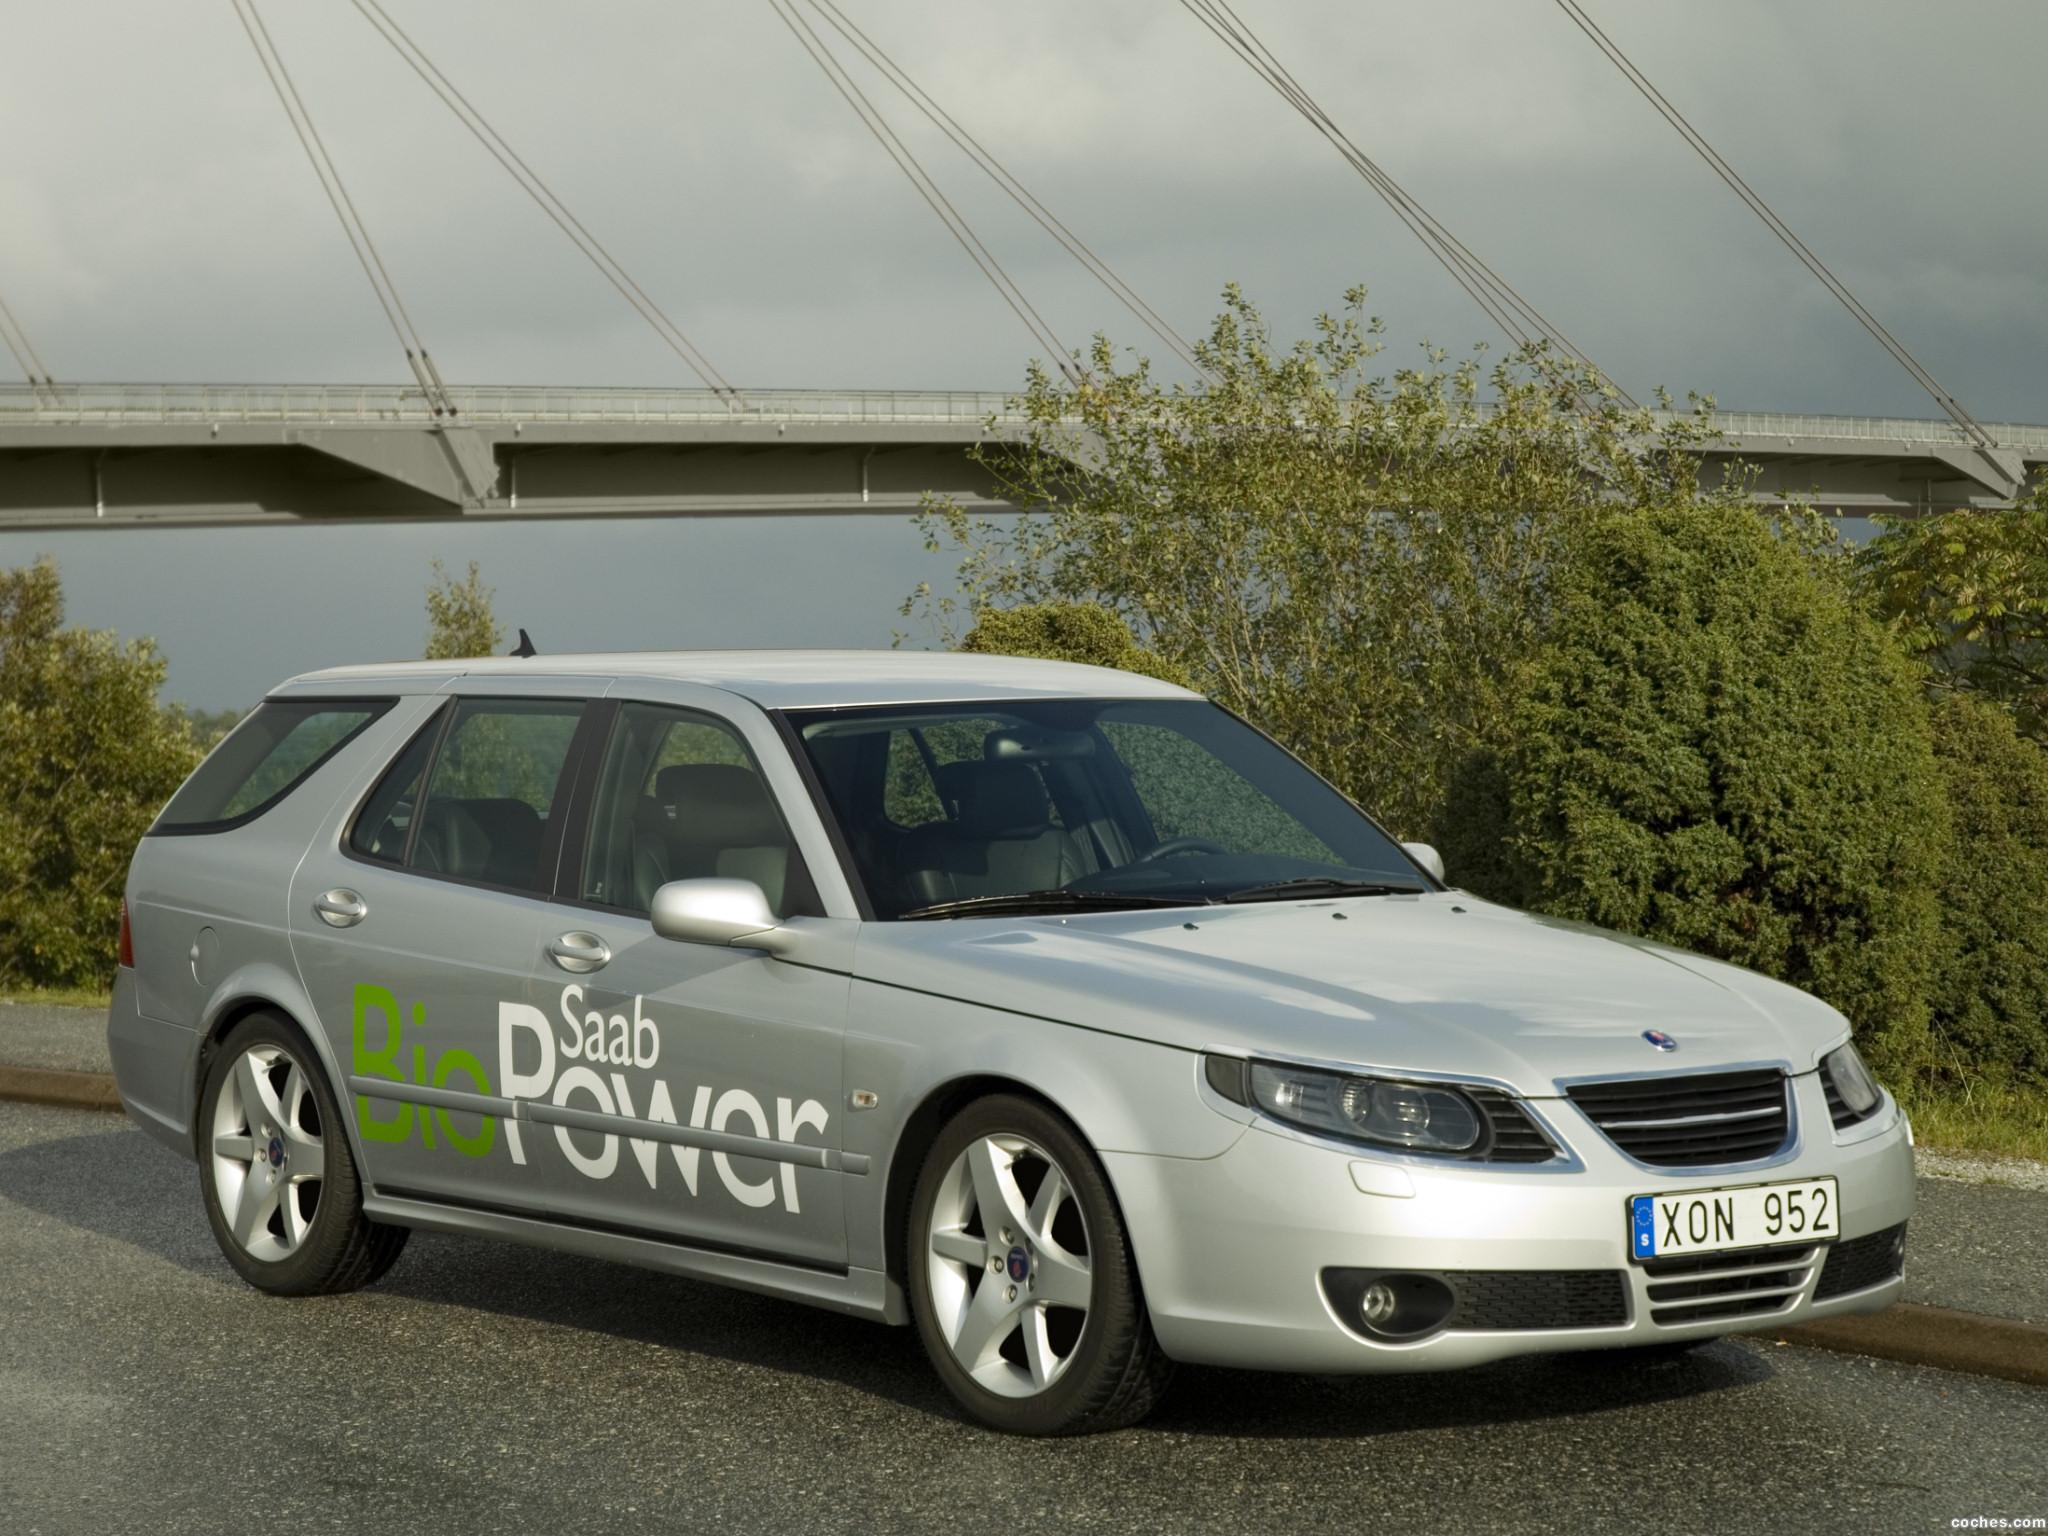 Foto 0 de Saab 9-5 BioPower Combi 2007